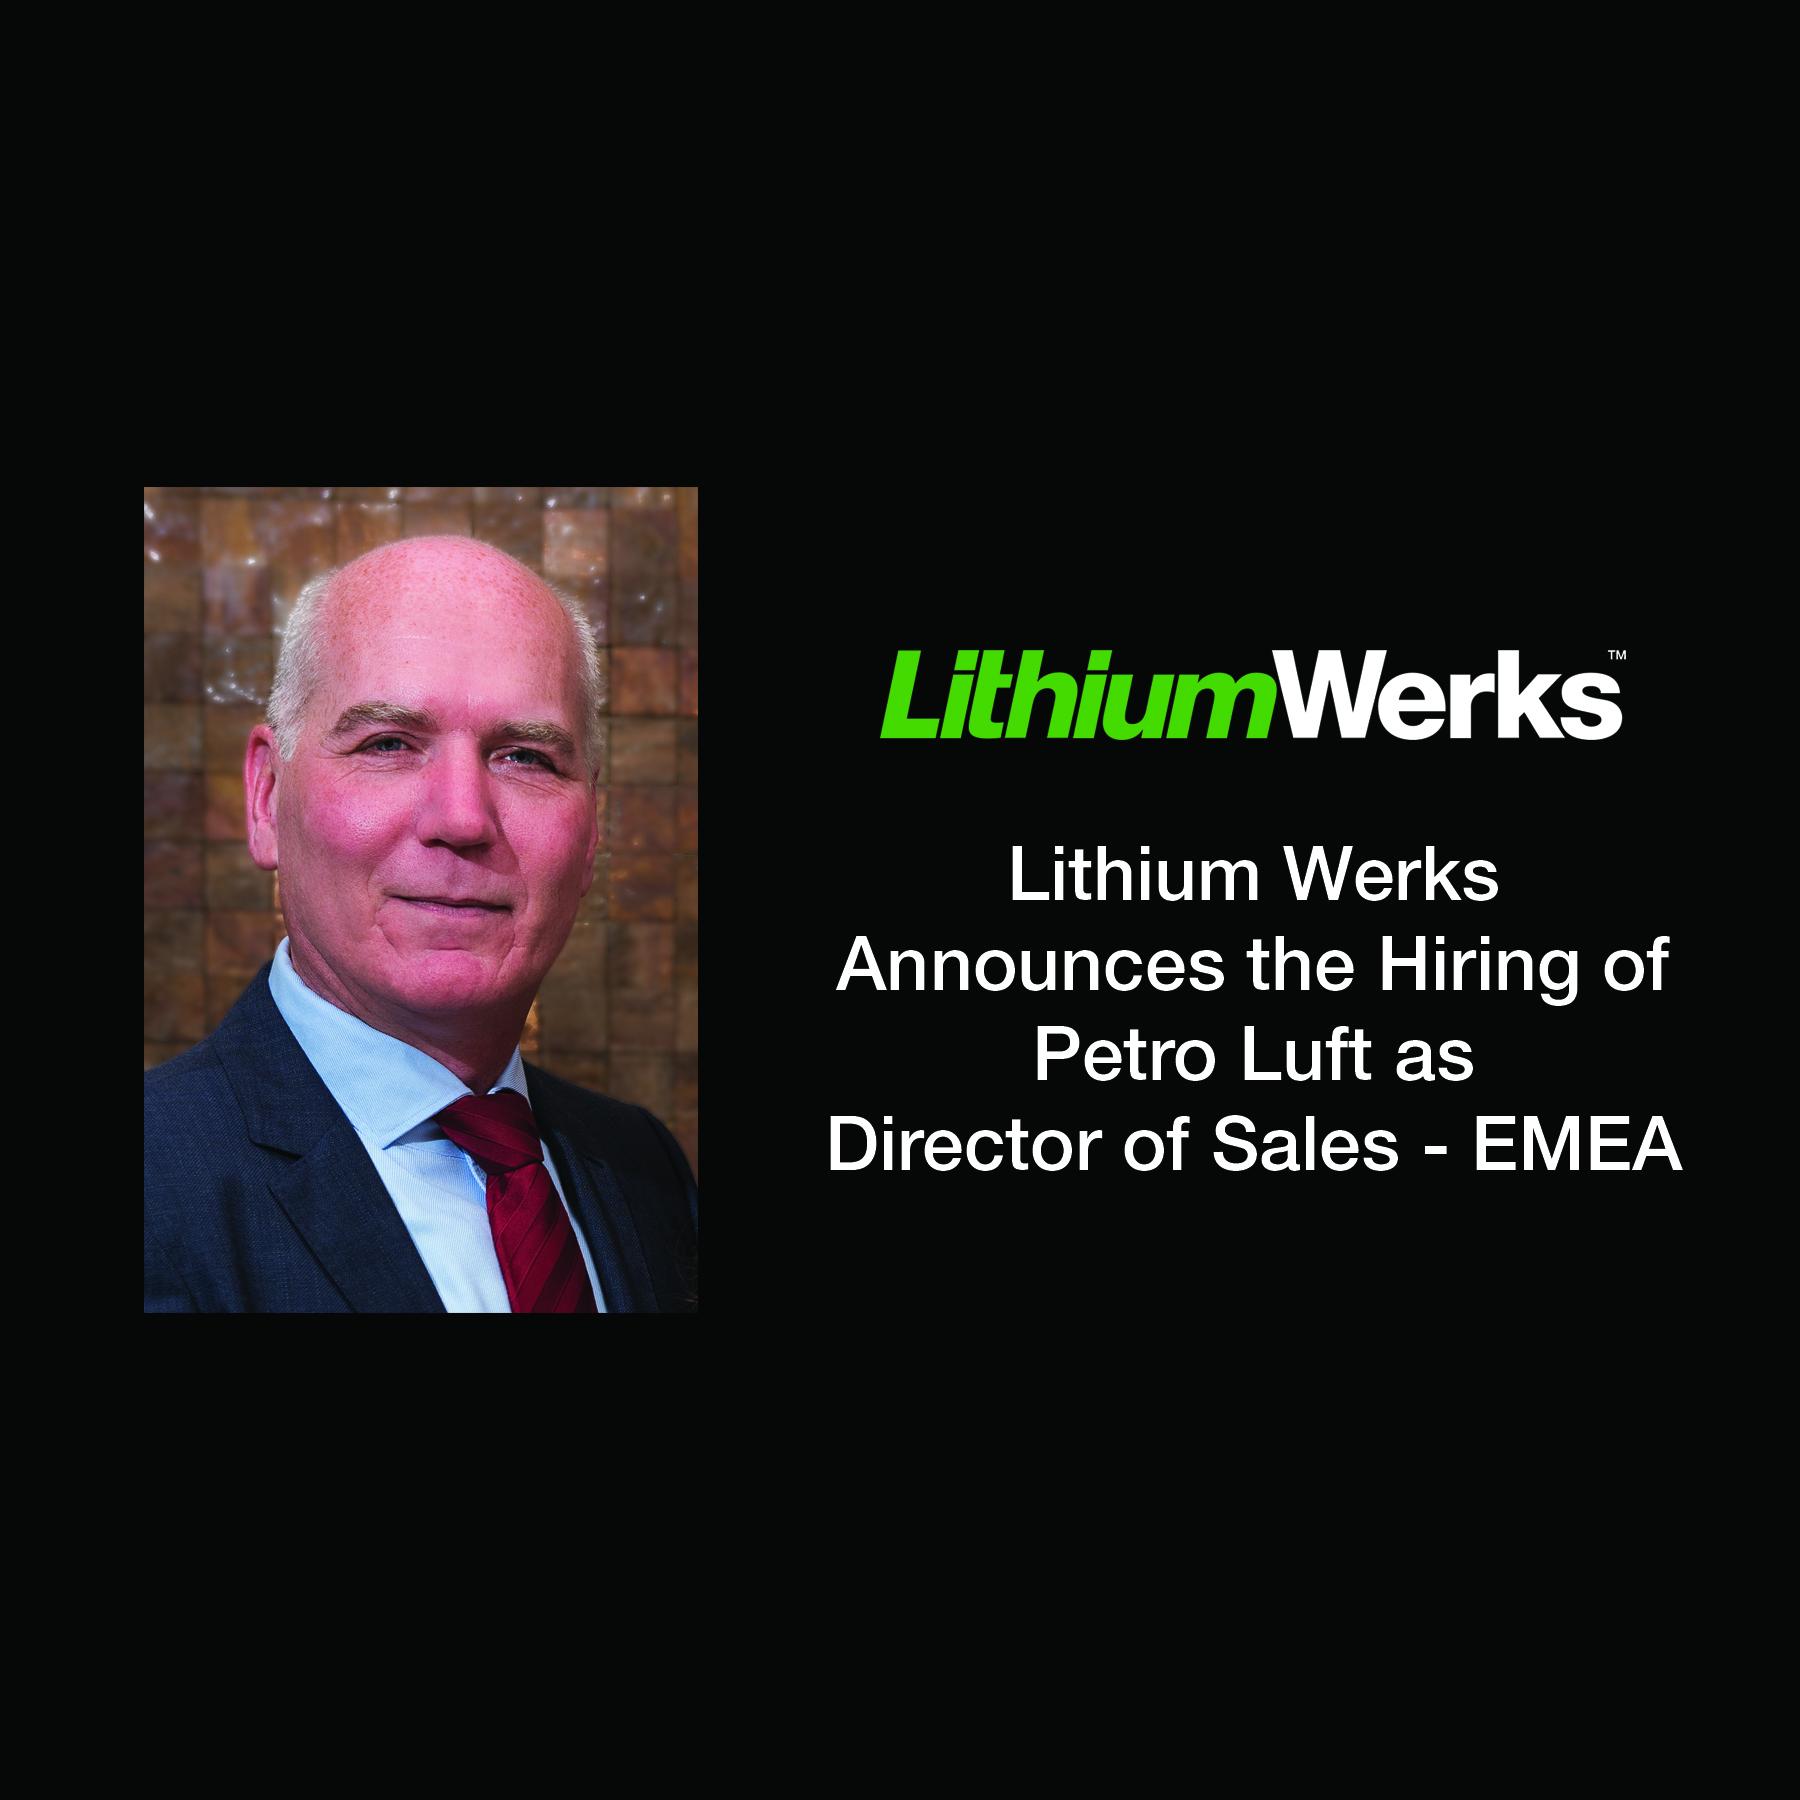 Luft Hired as Dir of Sales EMEA